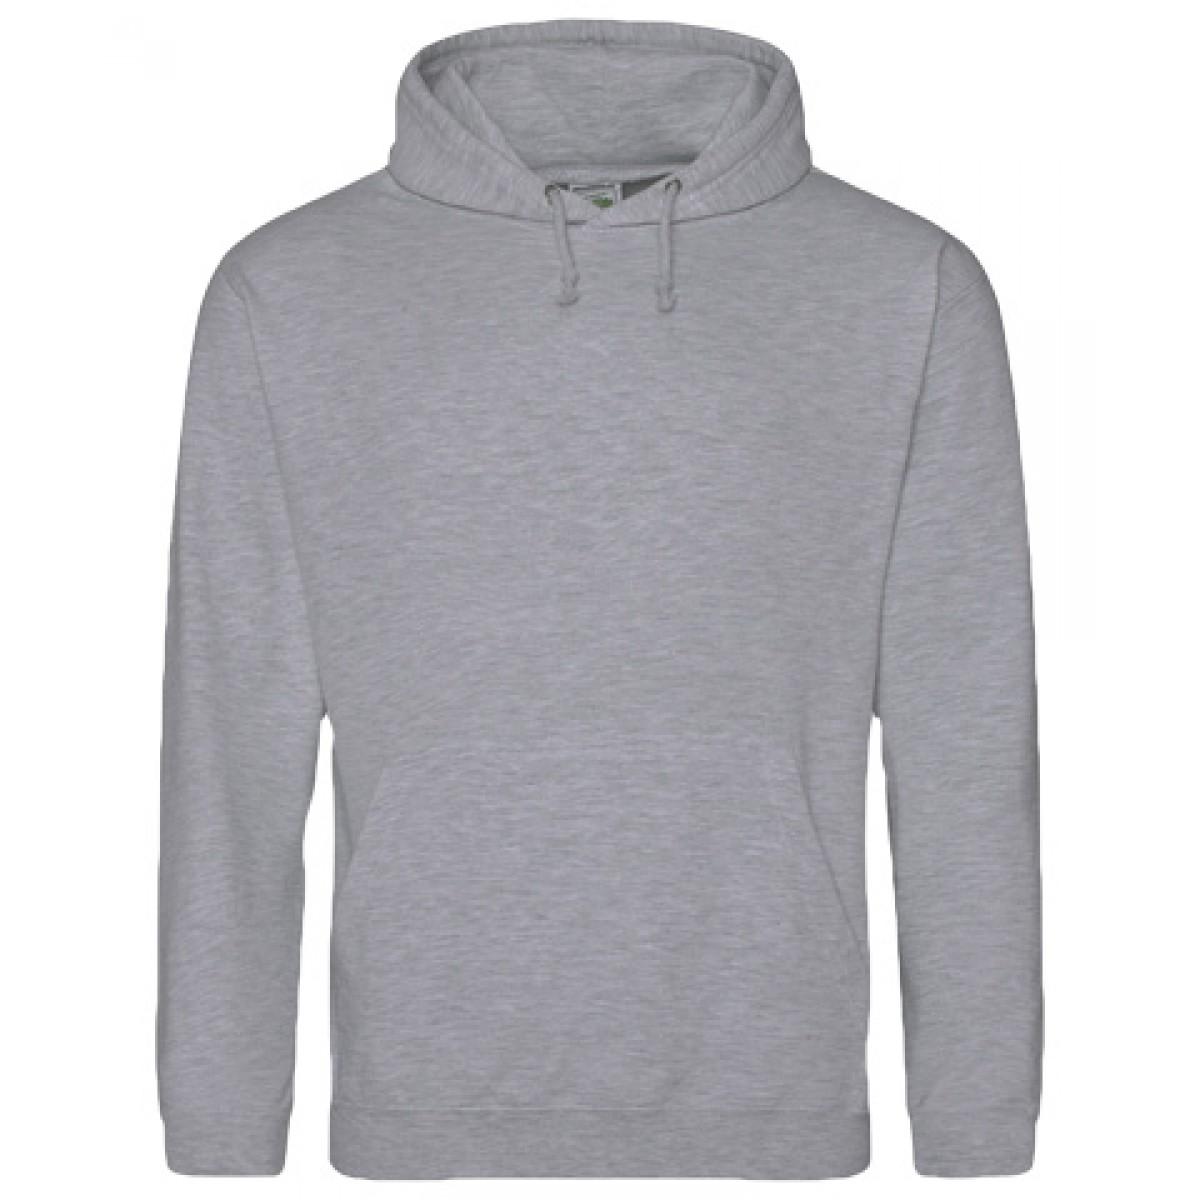 Hooded Sweatshirt 50/50 Heavy Blend-Gray-2XL